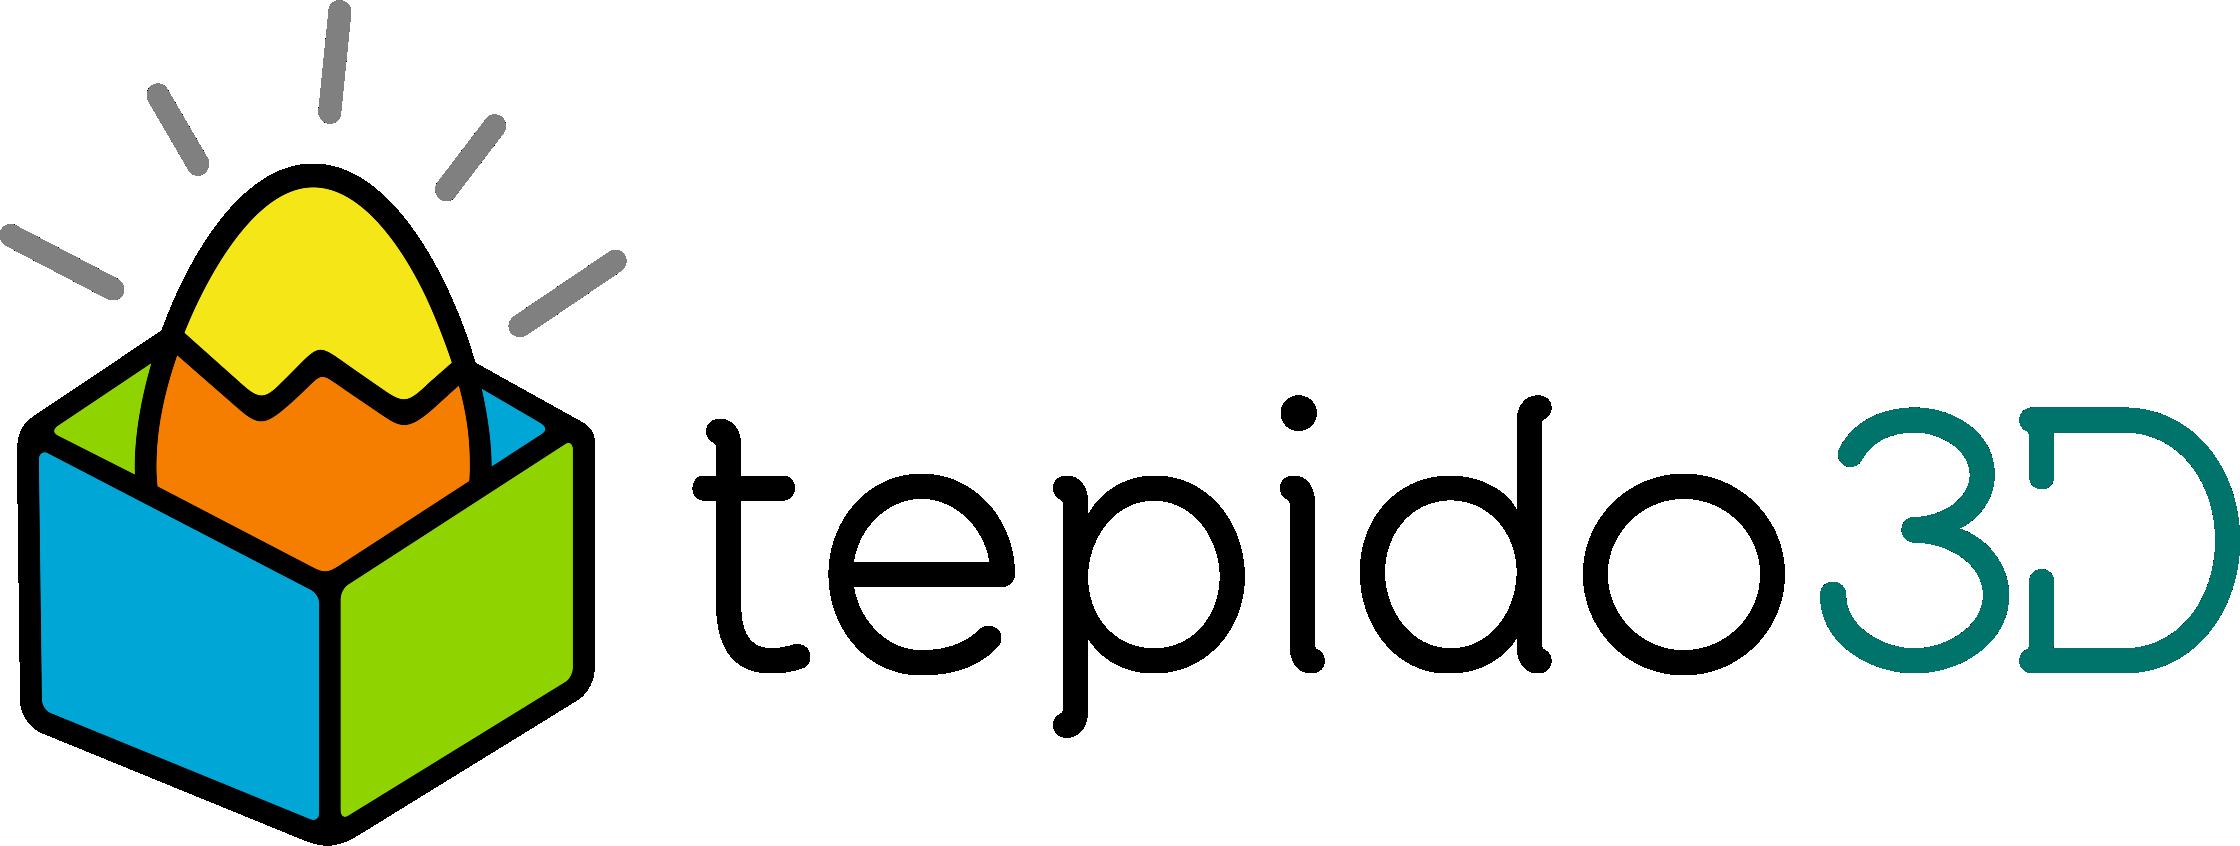 tepido3d-logo